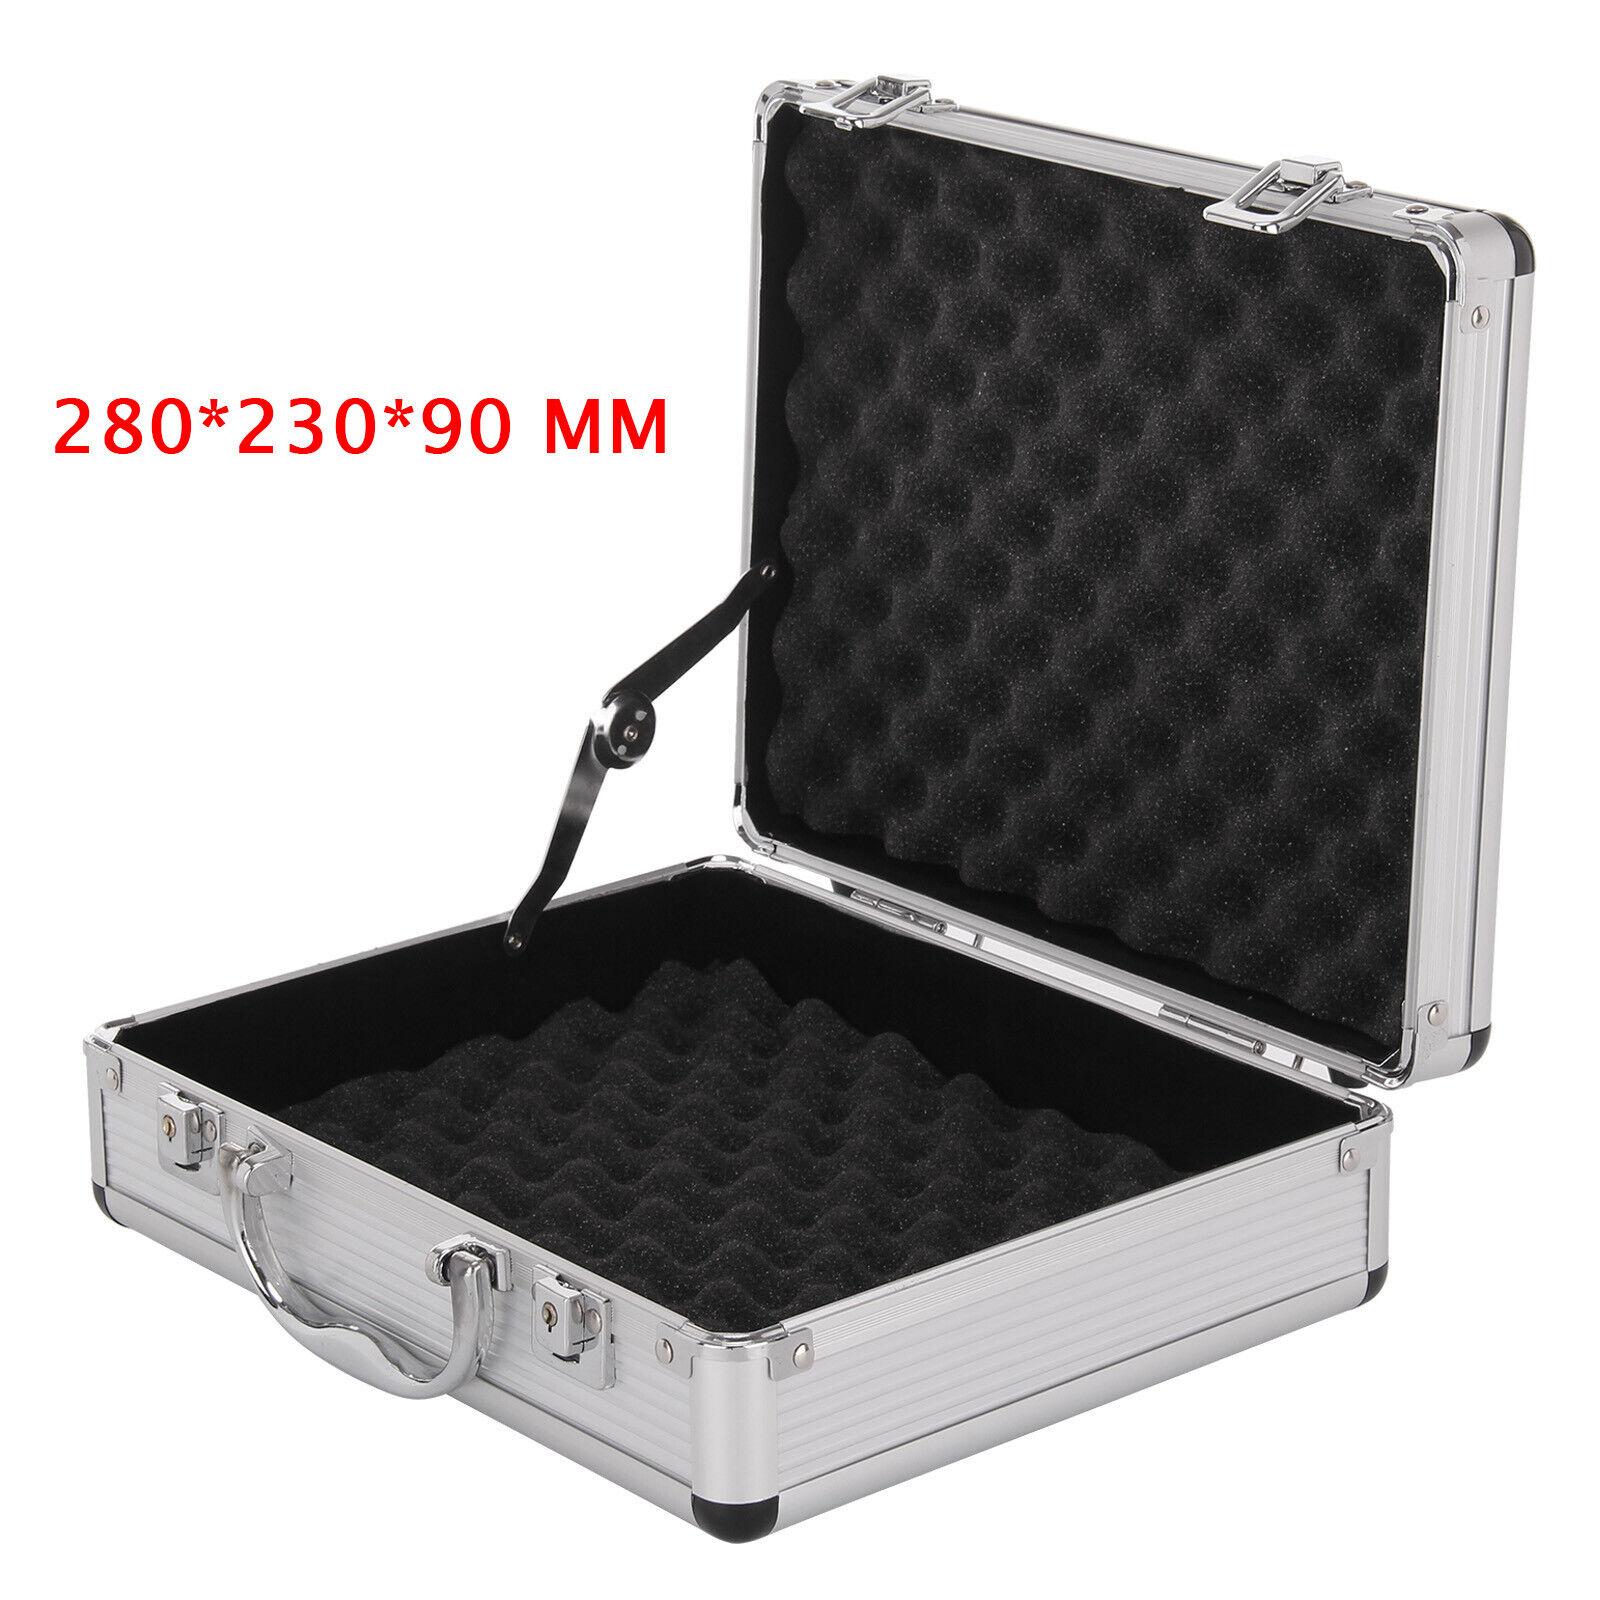 Aluminium Pistol Gun Case Storage Lockable Flight Case Foam Tool Box Secured UK